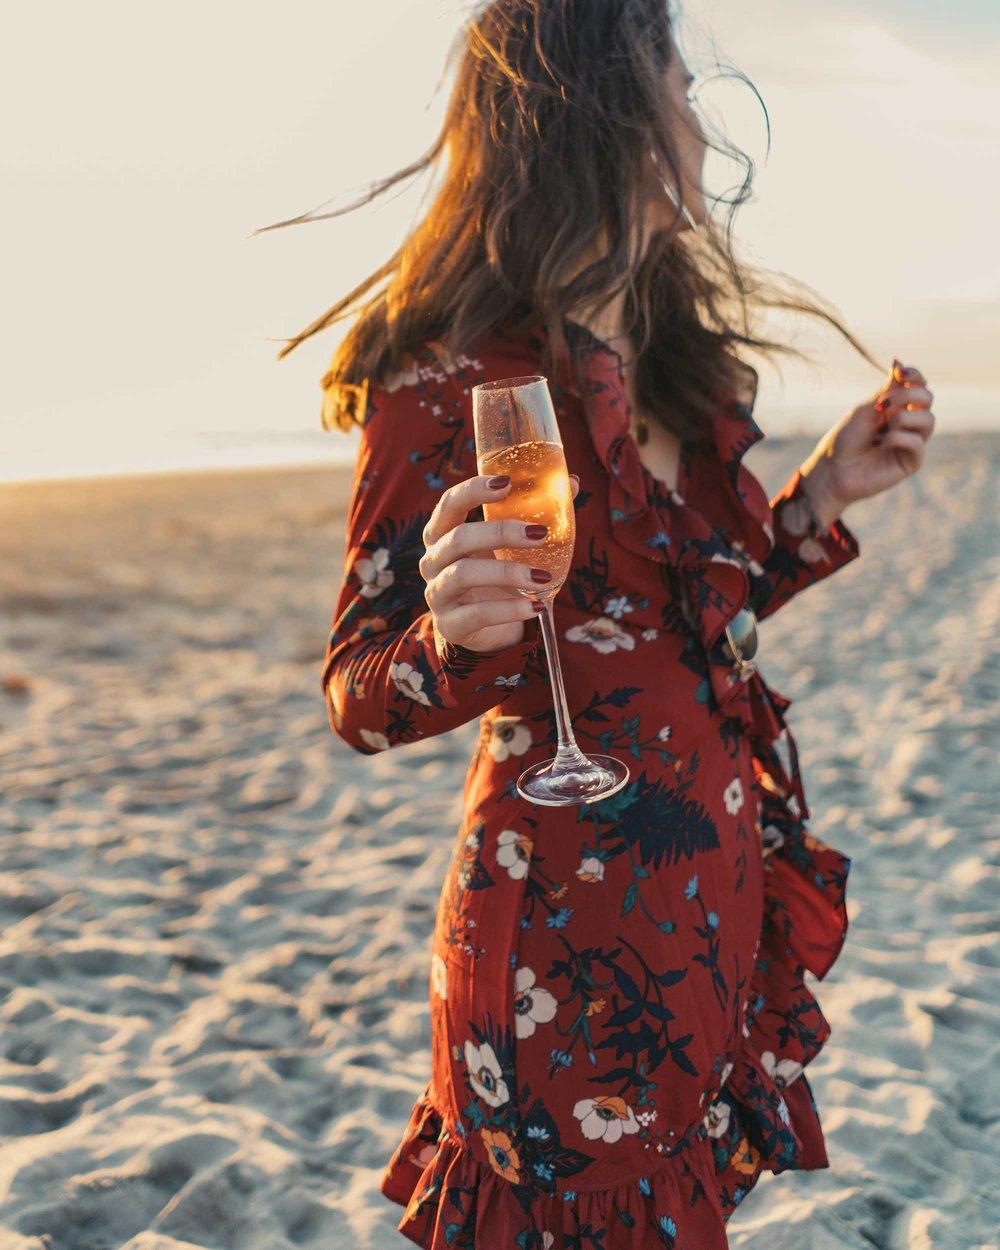 BURGUNDY-FLORAL-FRILL-WRAP-MINI-DRESS-Newport-Beach-California-Summer-Dress-3.jpg